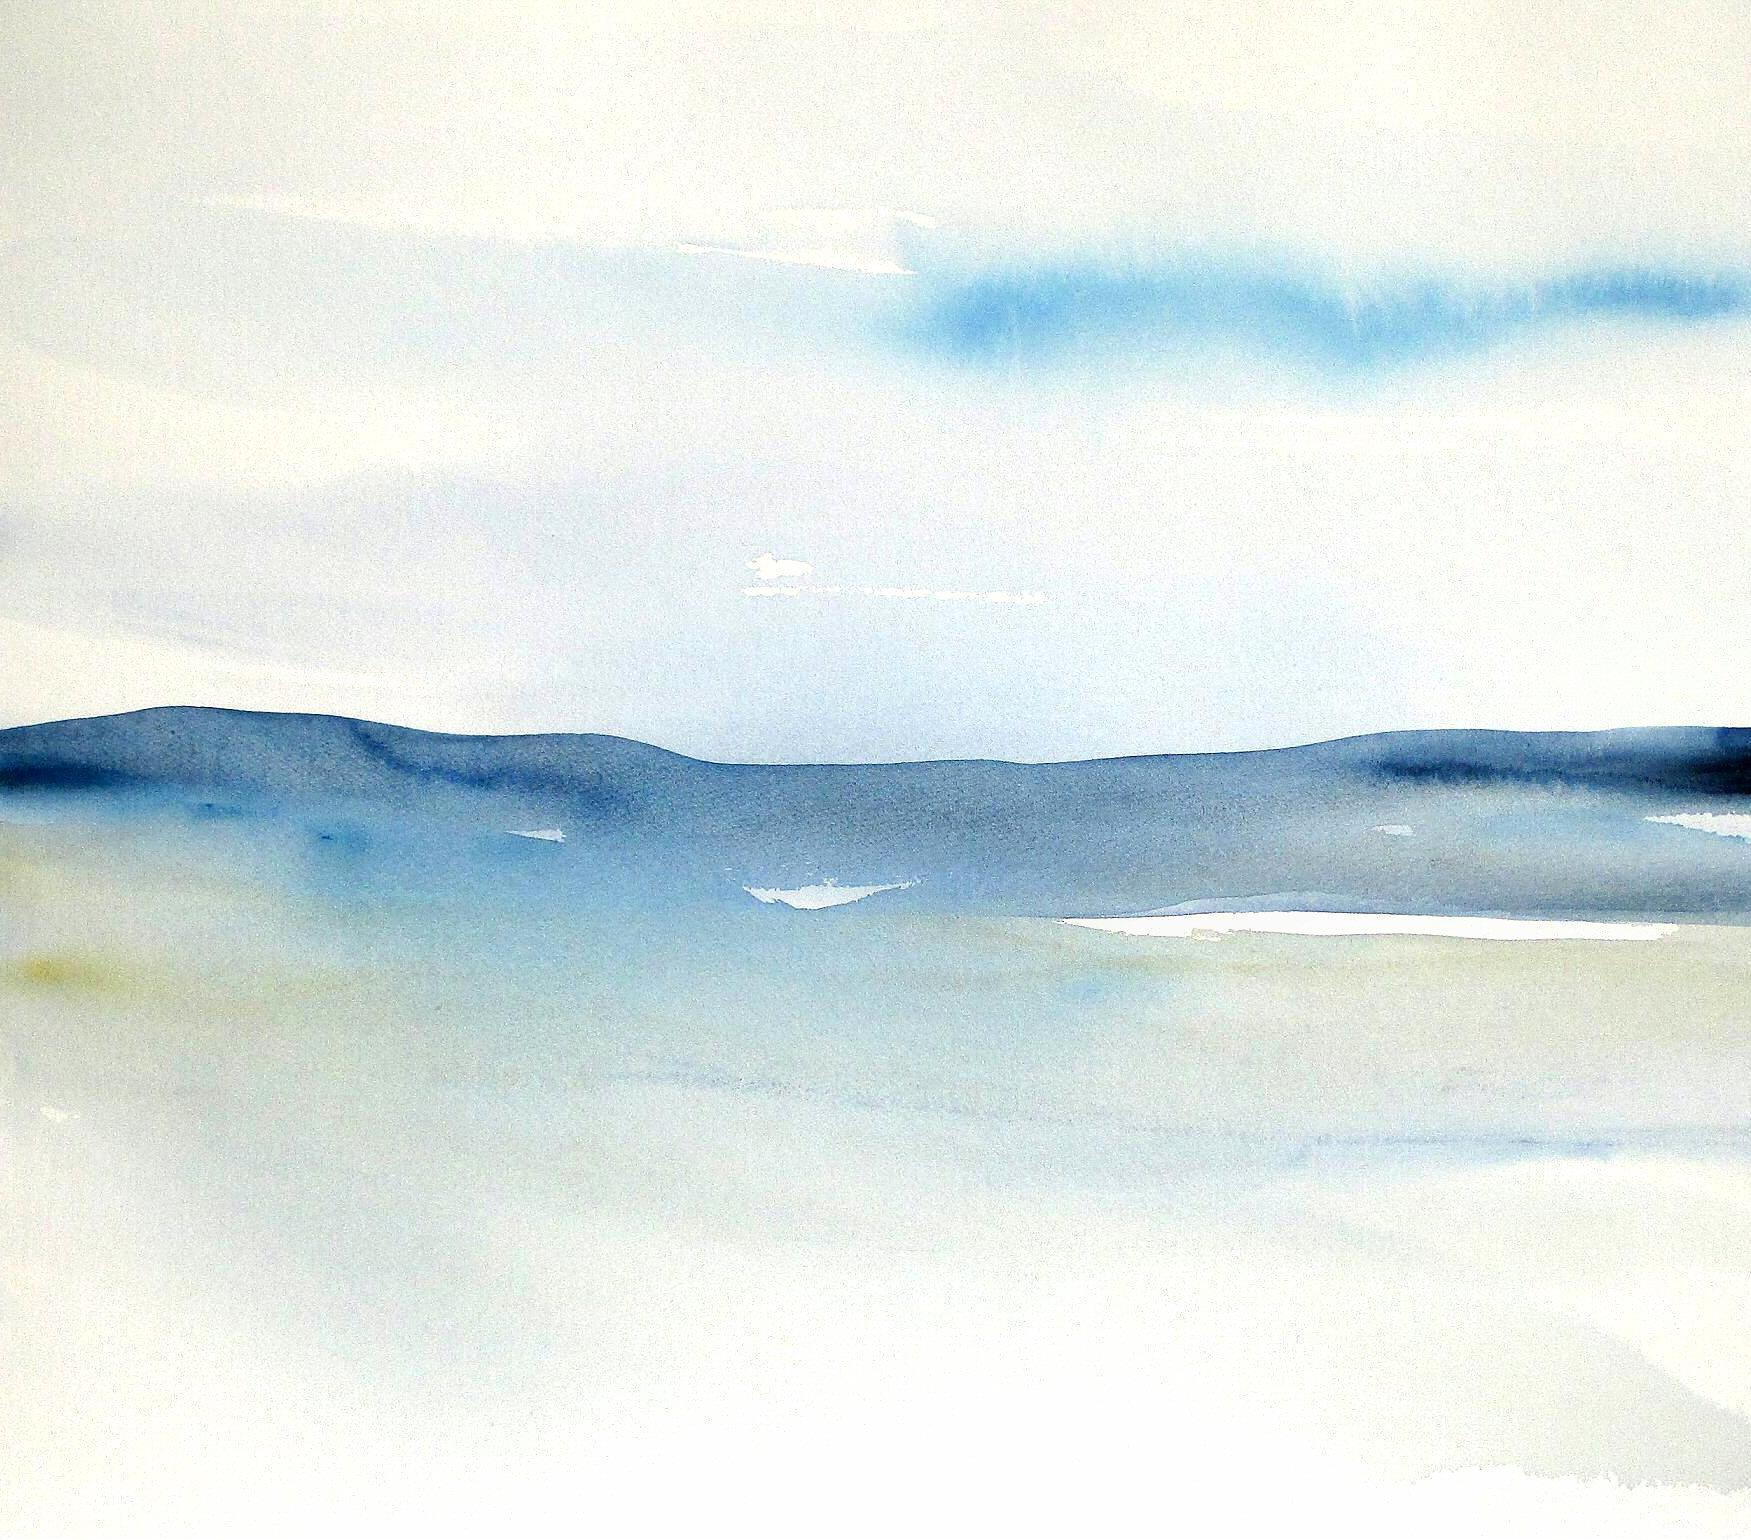 1751x1540 Original Contemporary Abstract Seascape Landscape Watercolor